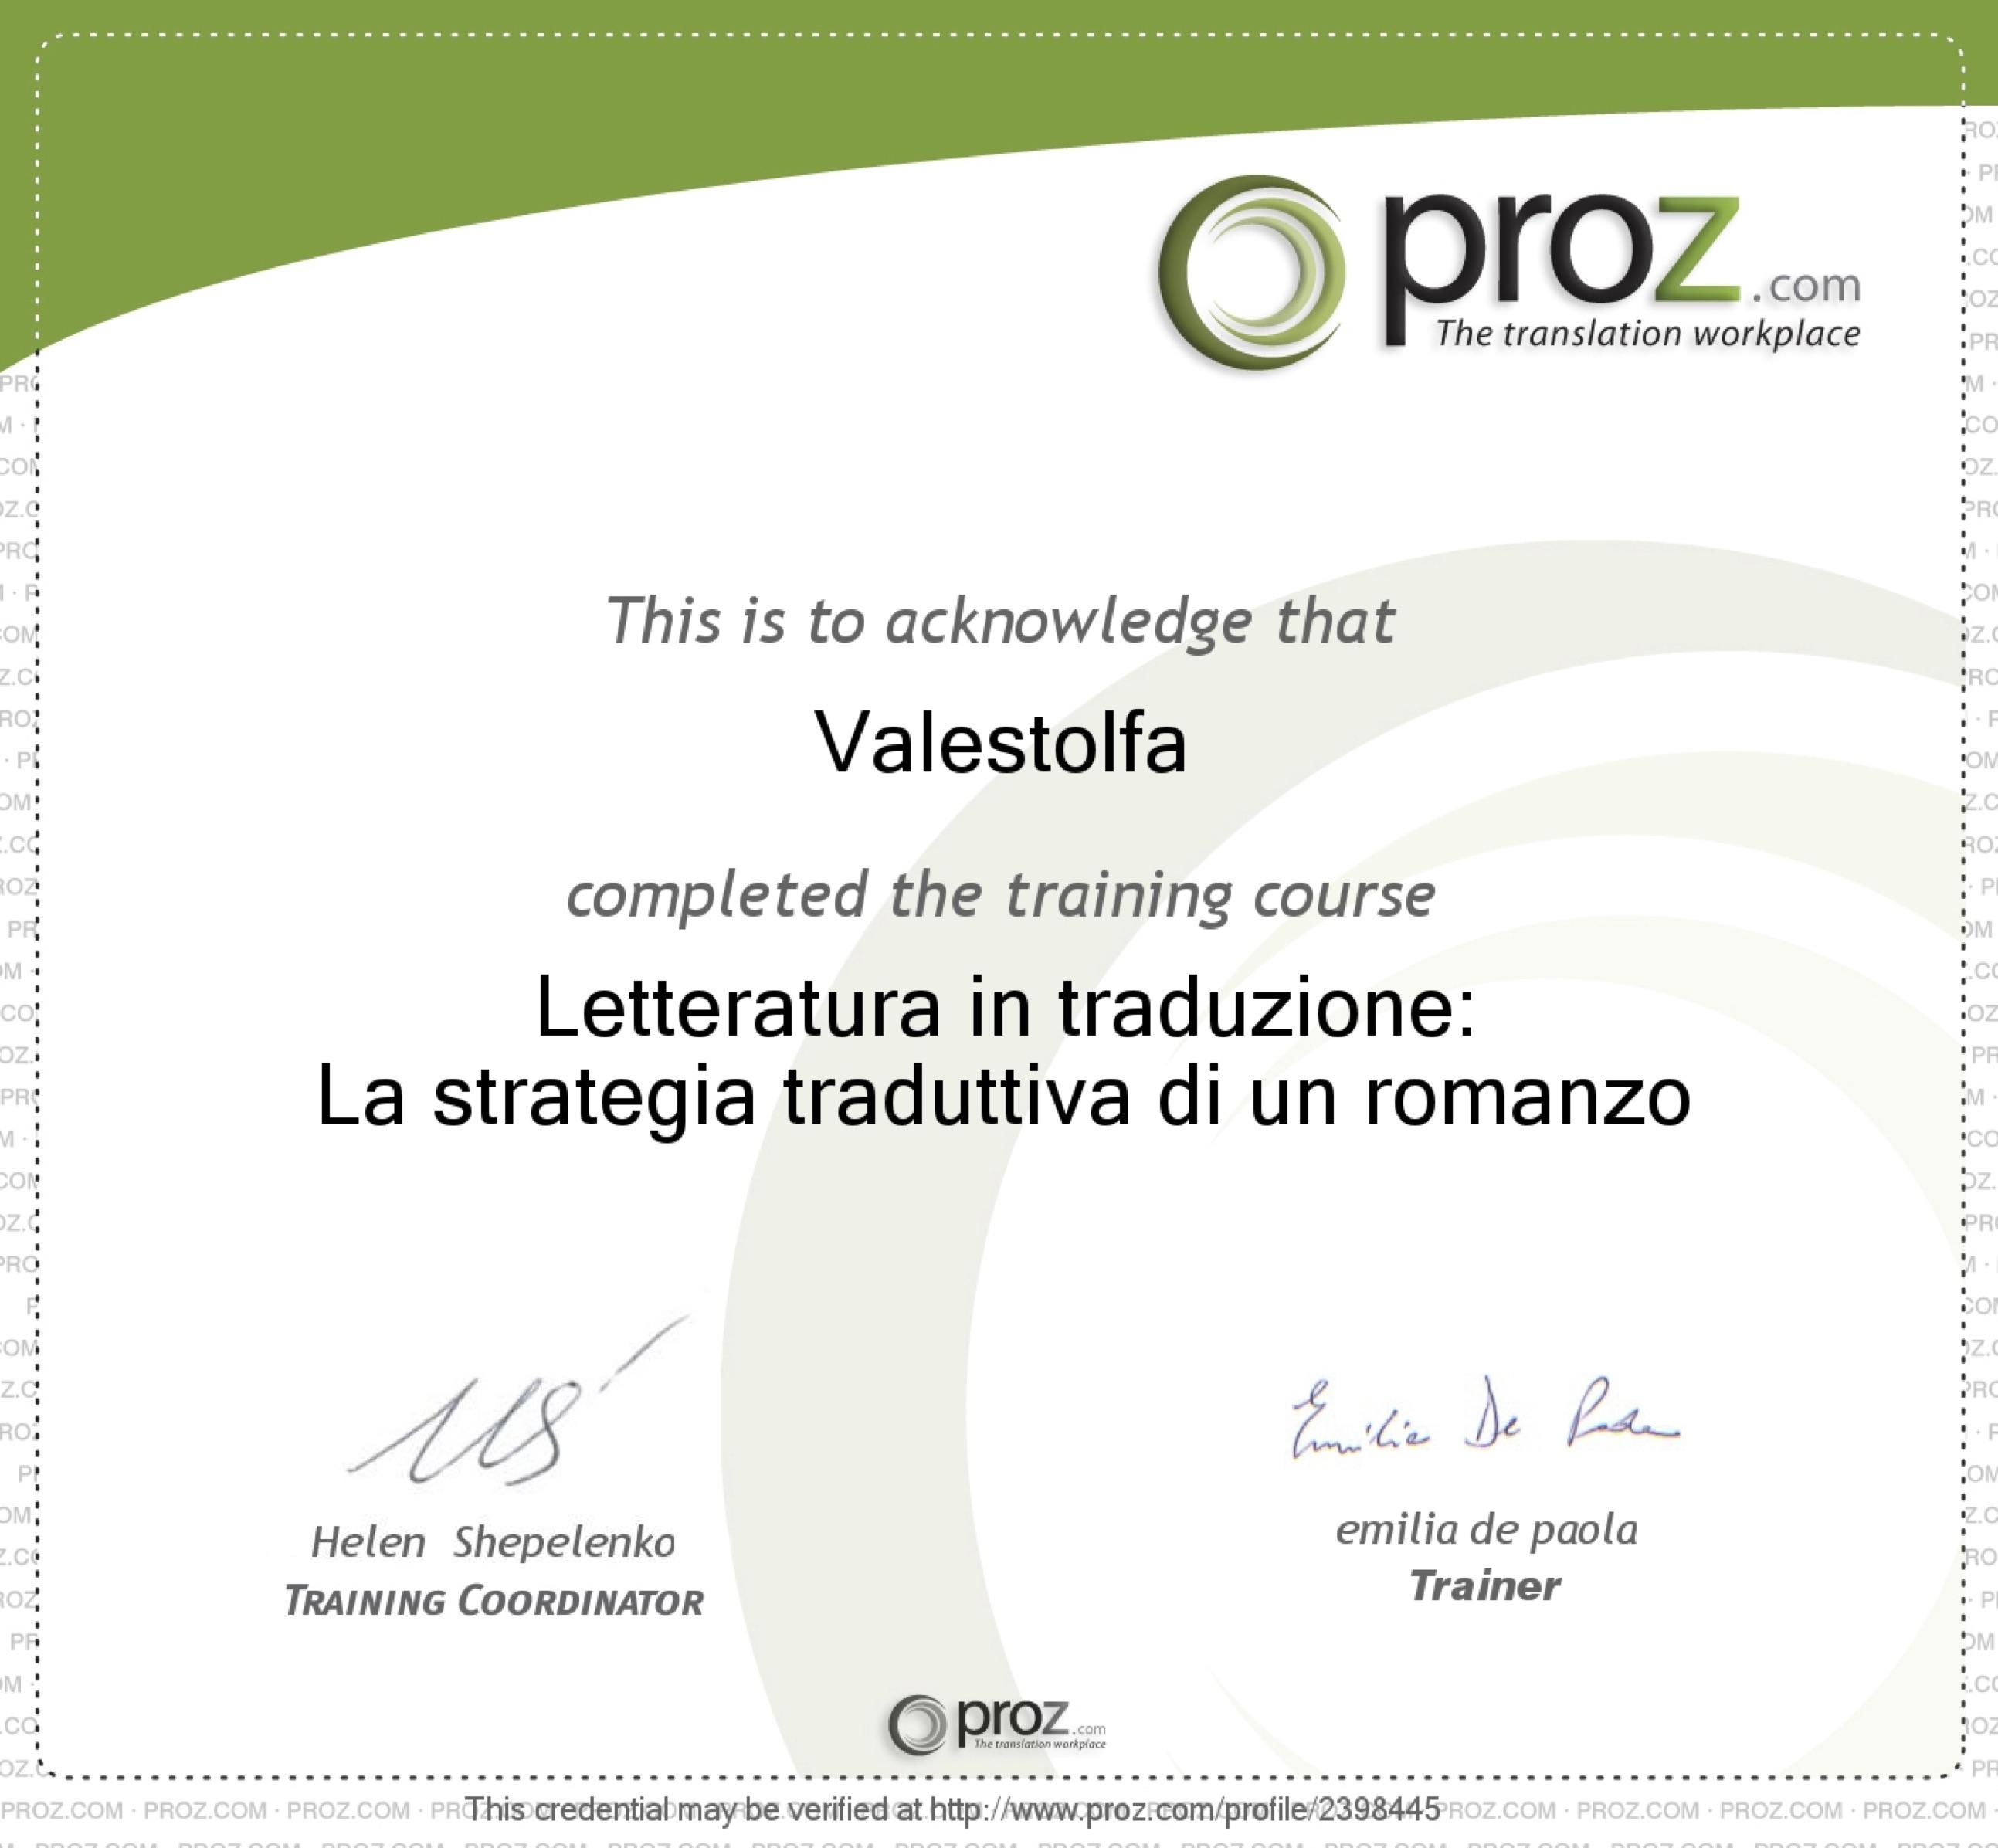 Proz certificate